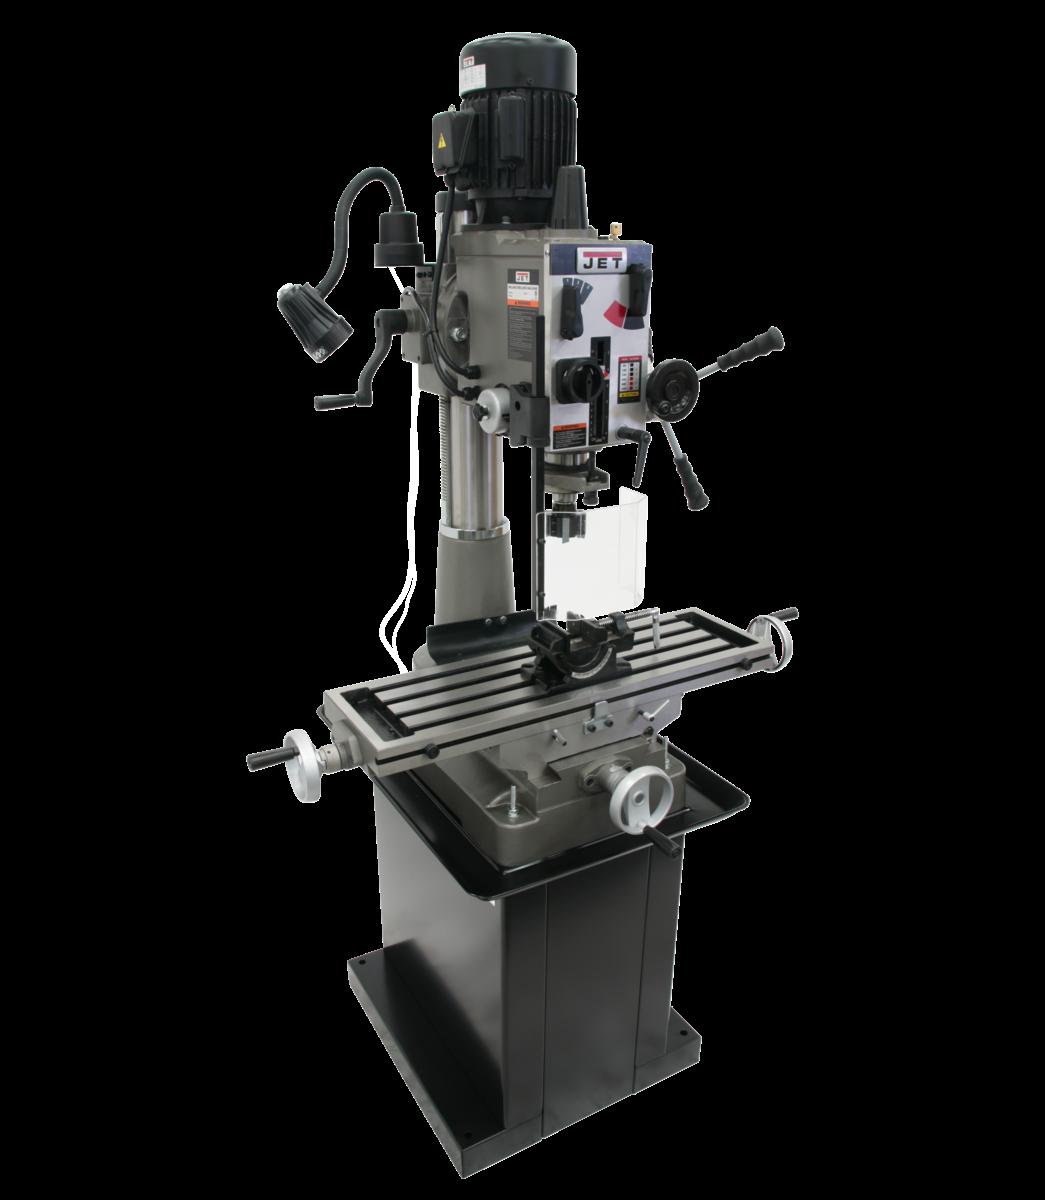 JMD-40GH Geared Head Mill/Drill with Newall DP500 2-Axis DRO &  X-Powerfeed